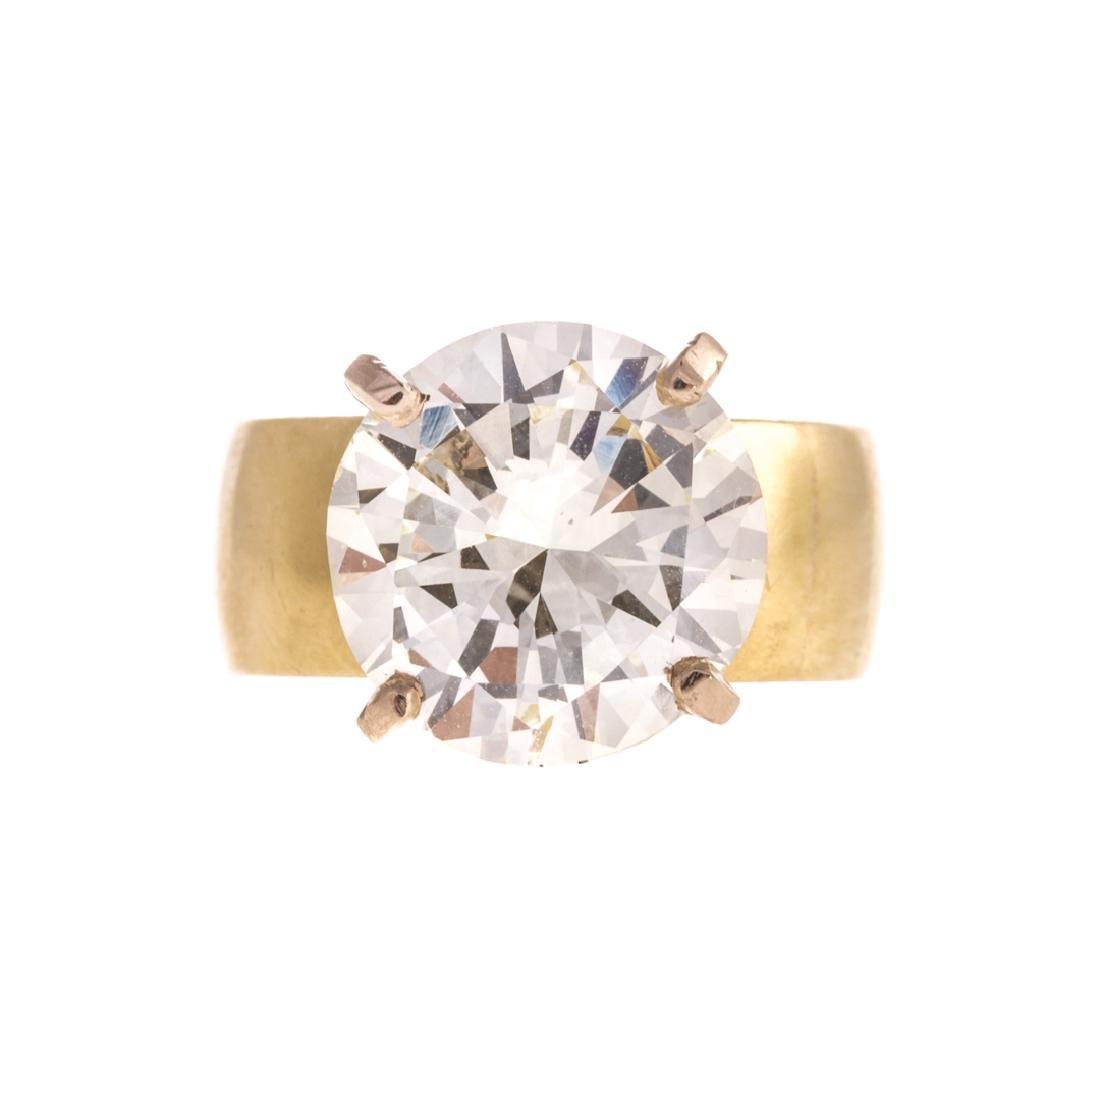 A Lady's 6.10 Round Brilliant Diamond Ring